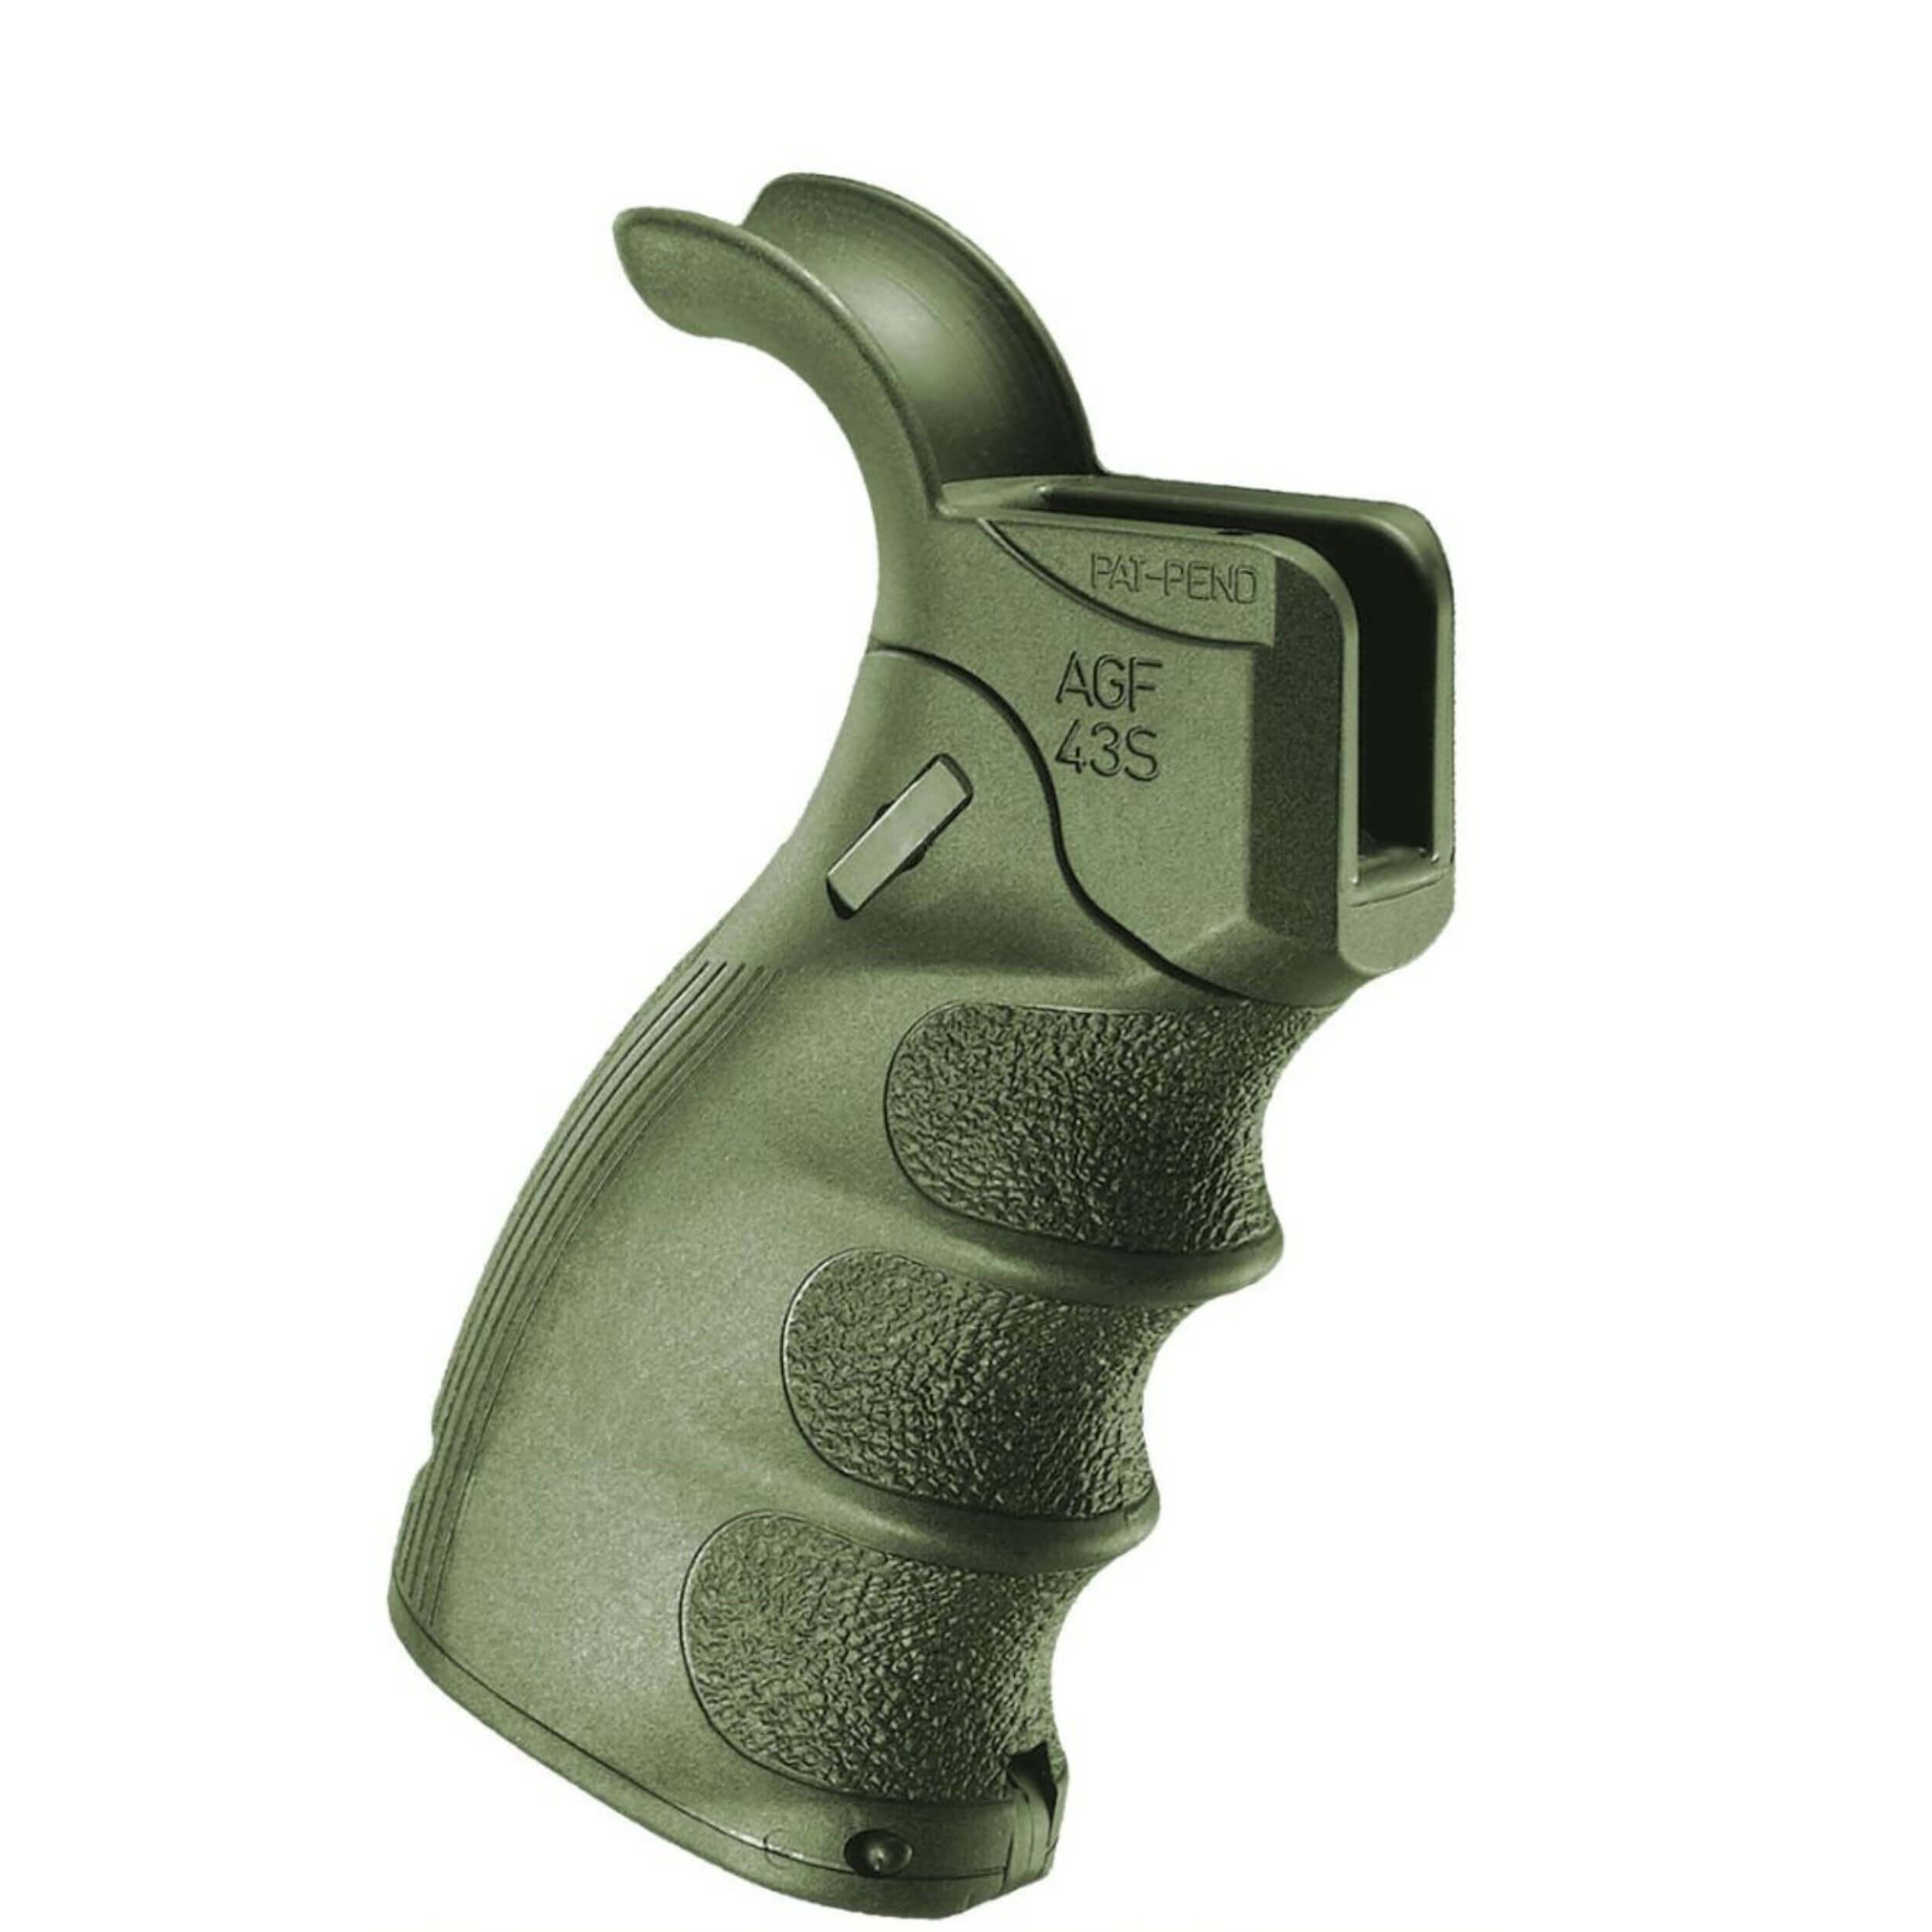 AGF-43S  Folding Pistol Grip for  M16 / M4 / AR-15